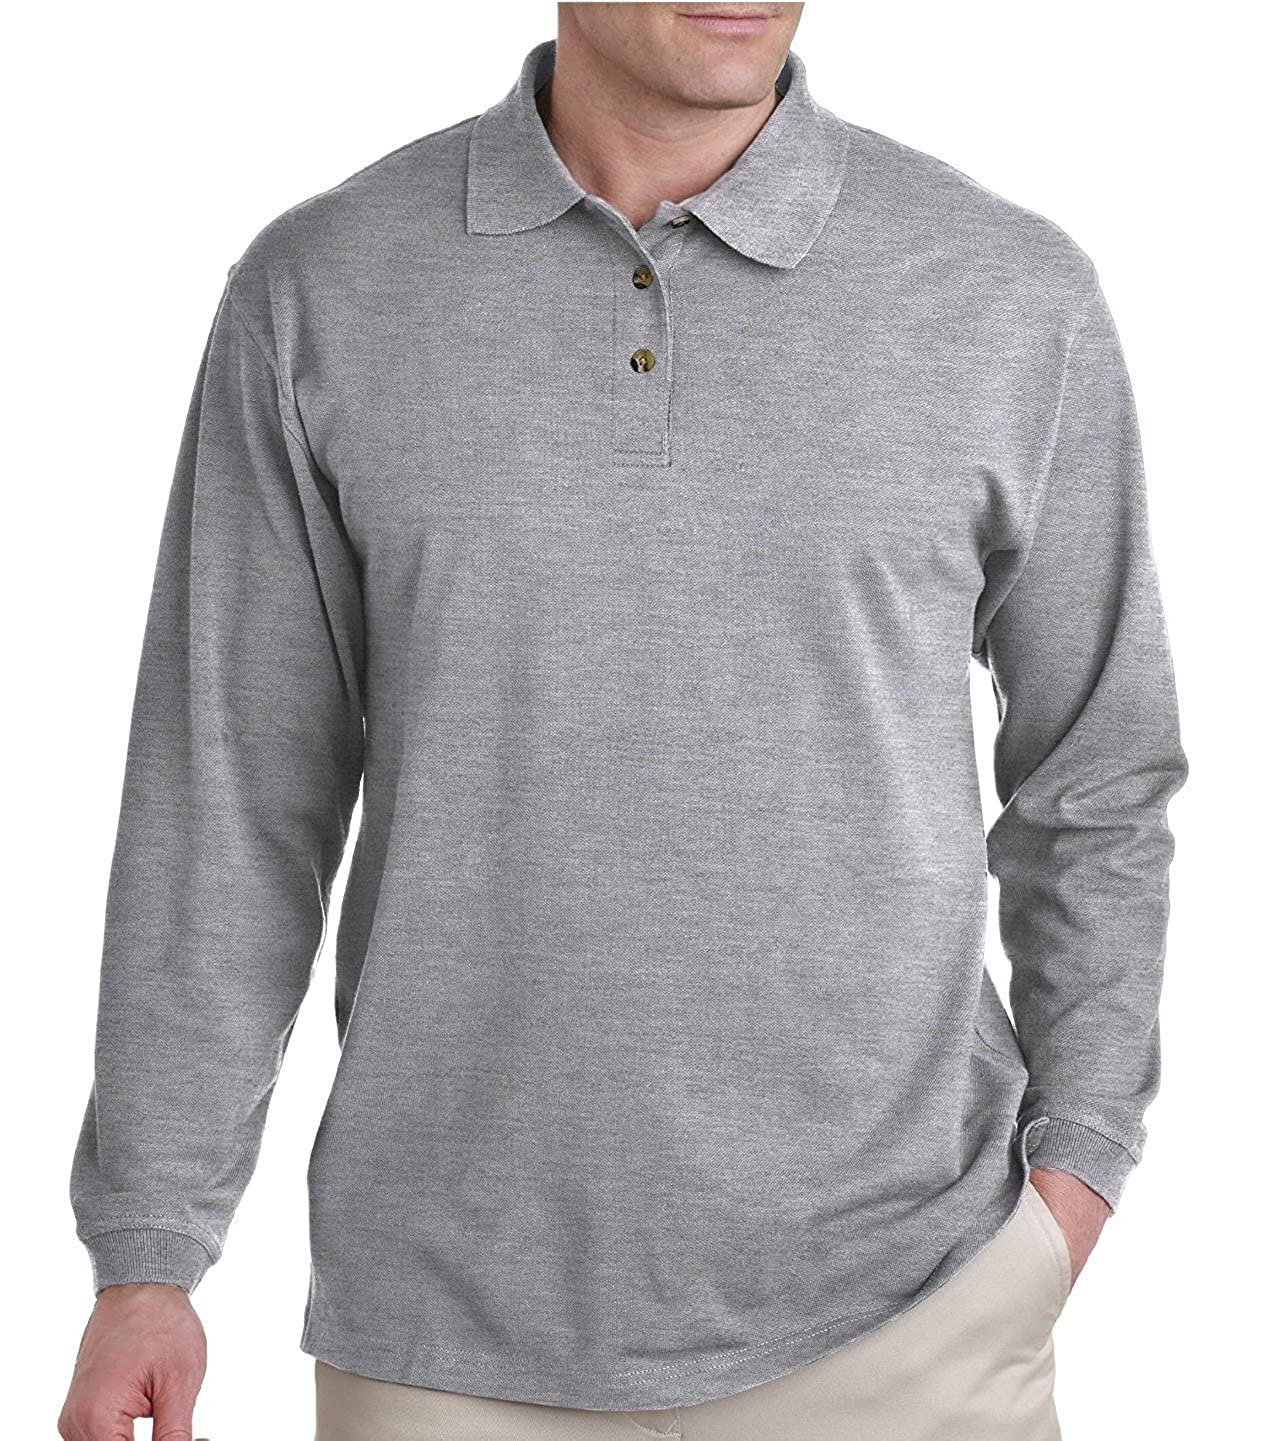 Woqn Mens Polo Shirts Casual Cotton Long Sleeve Solid Polo Shirts Black